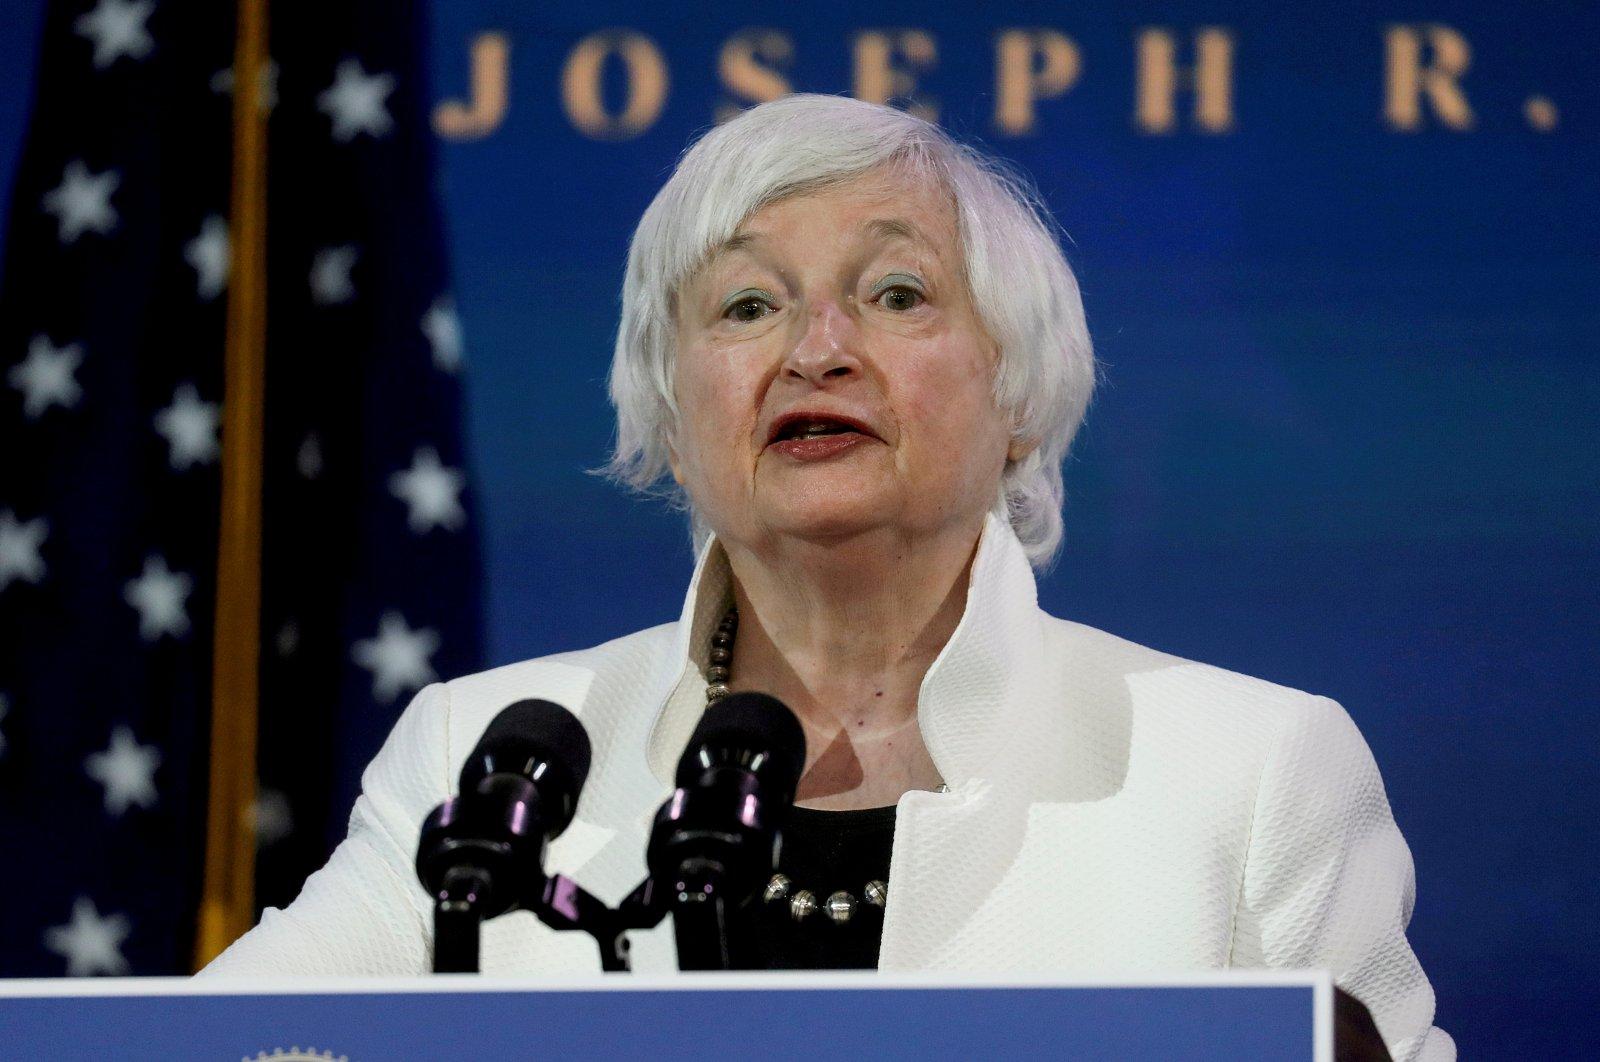 The U.S. Treasury Secretary-designate Janet Yellen in Wilmington, Delaware, U.S., Dec. 1, 2020. (Reuters Photo)